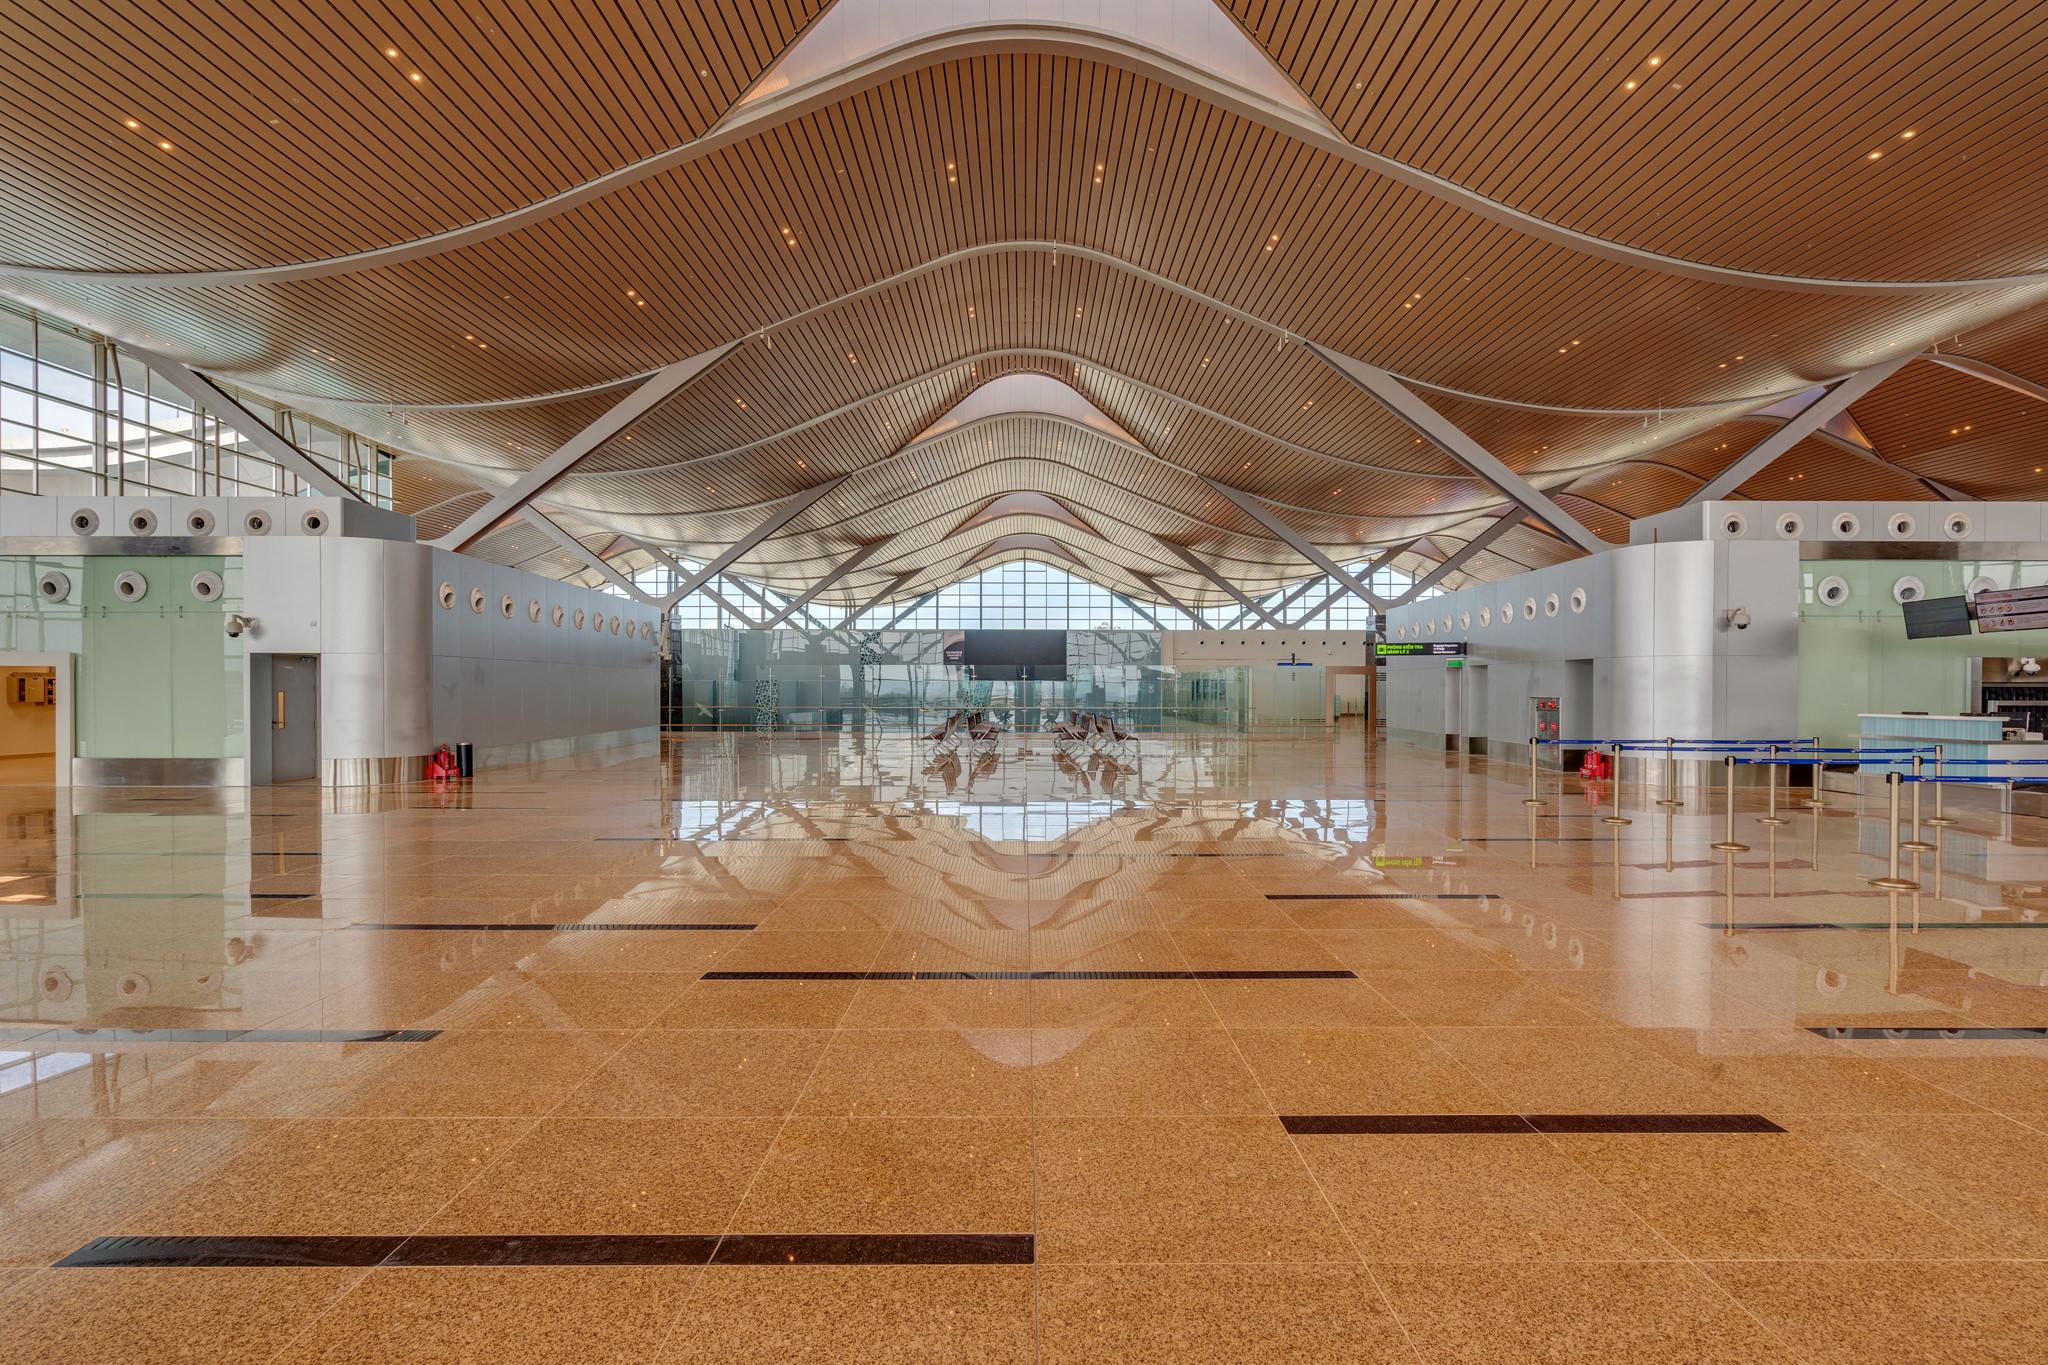 20180626 - Cam Ranh Airport - Architecture - 0306.jpg